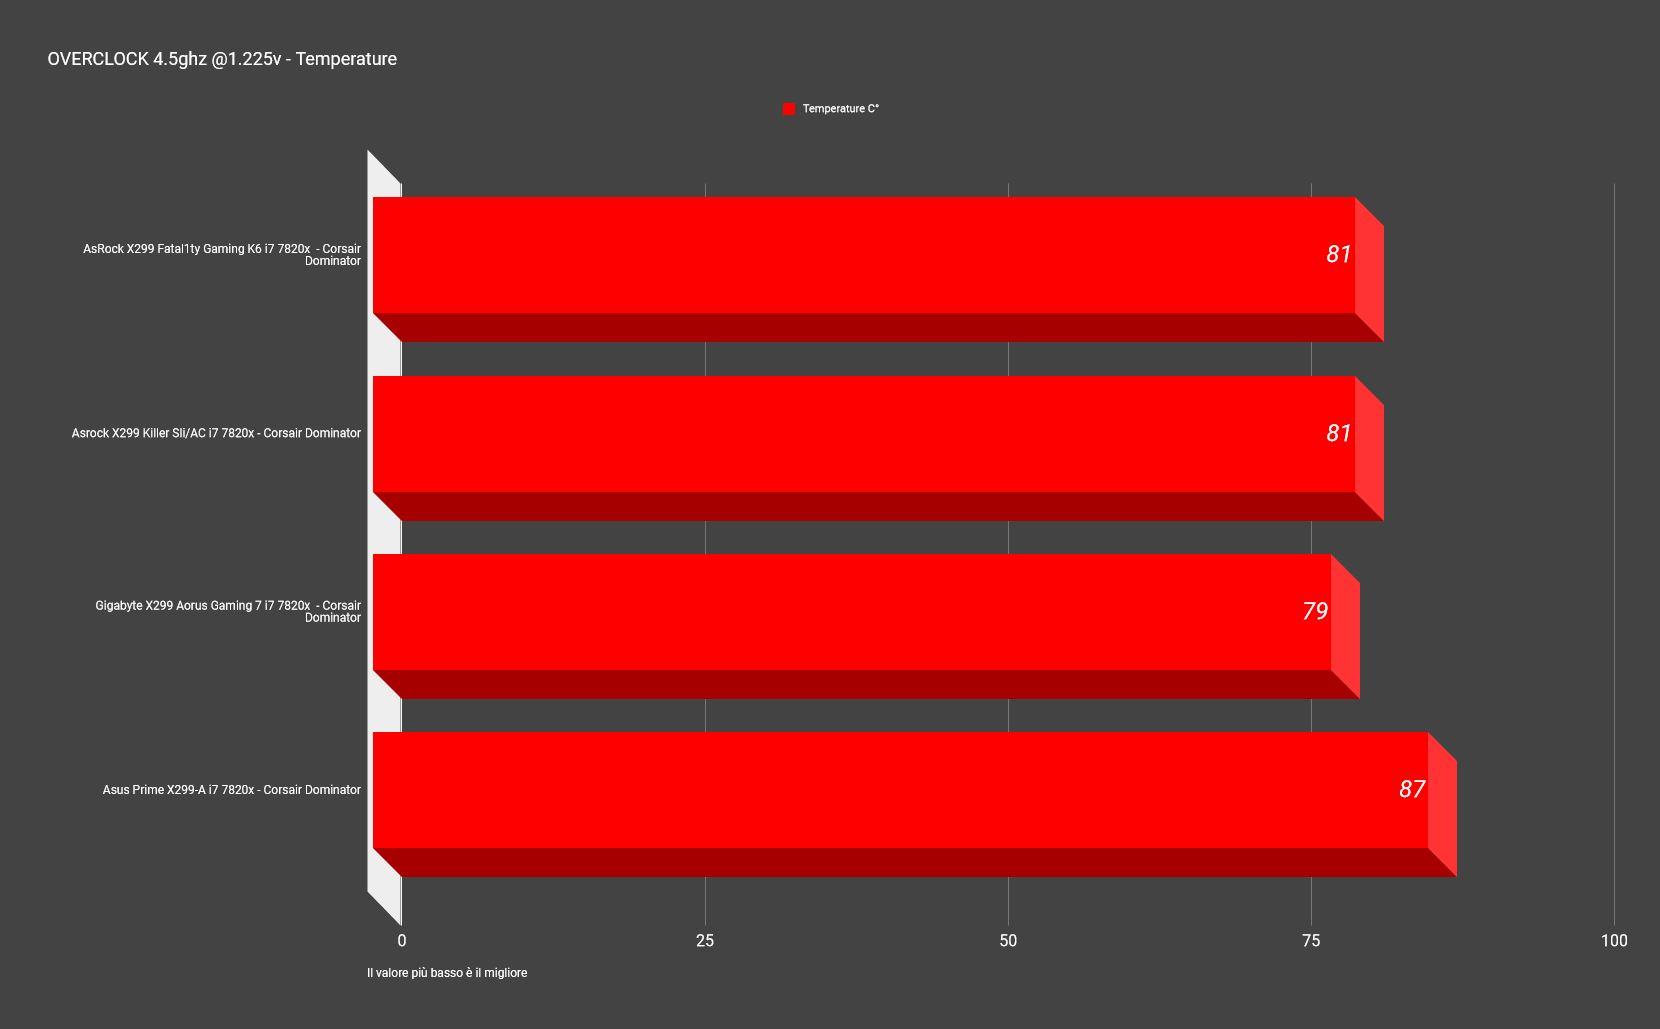 tempoverclockAsrock x299 - Recensione AsRock X299 Killer SLI/AC e Fatal1ty X299 Gaming K6